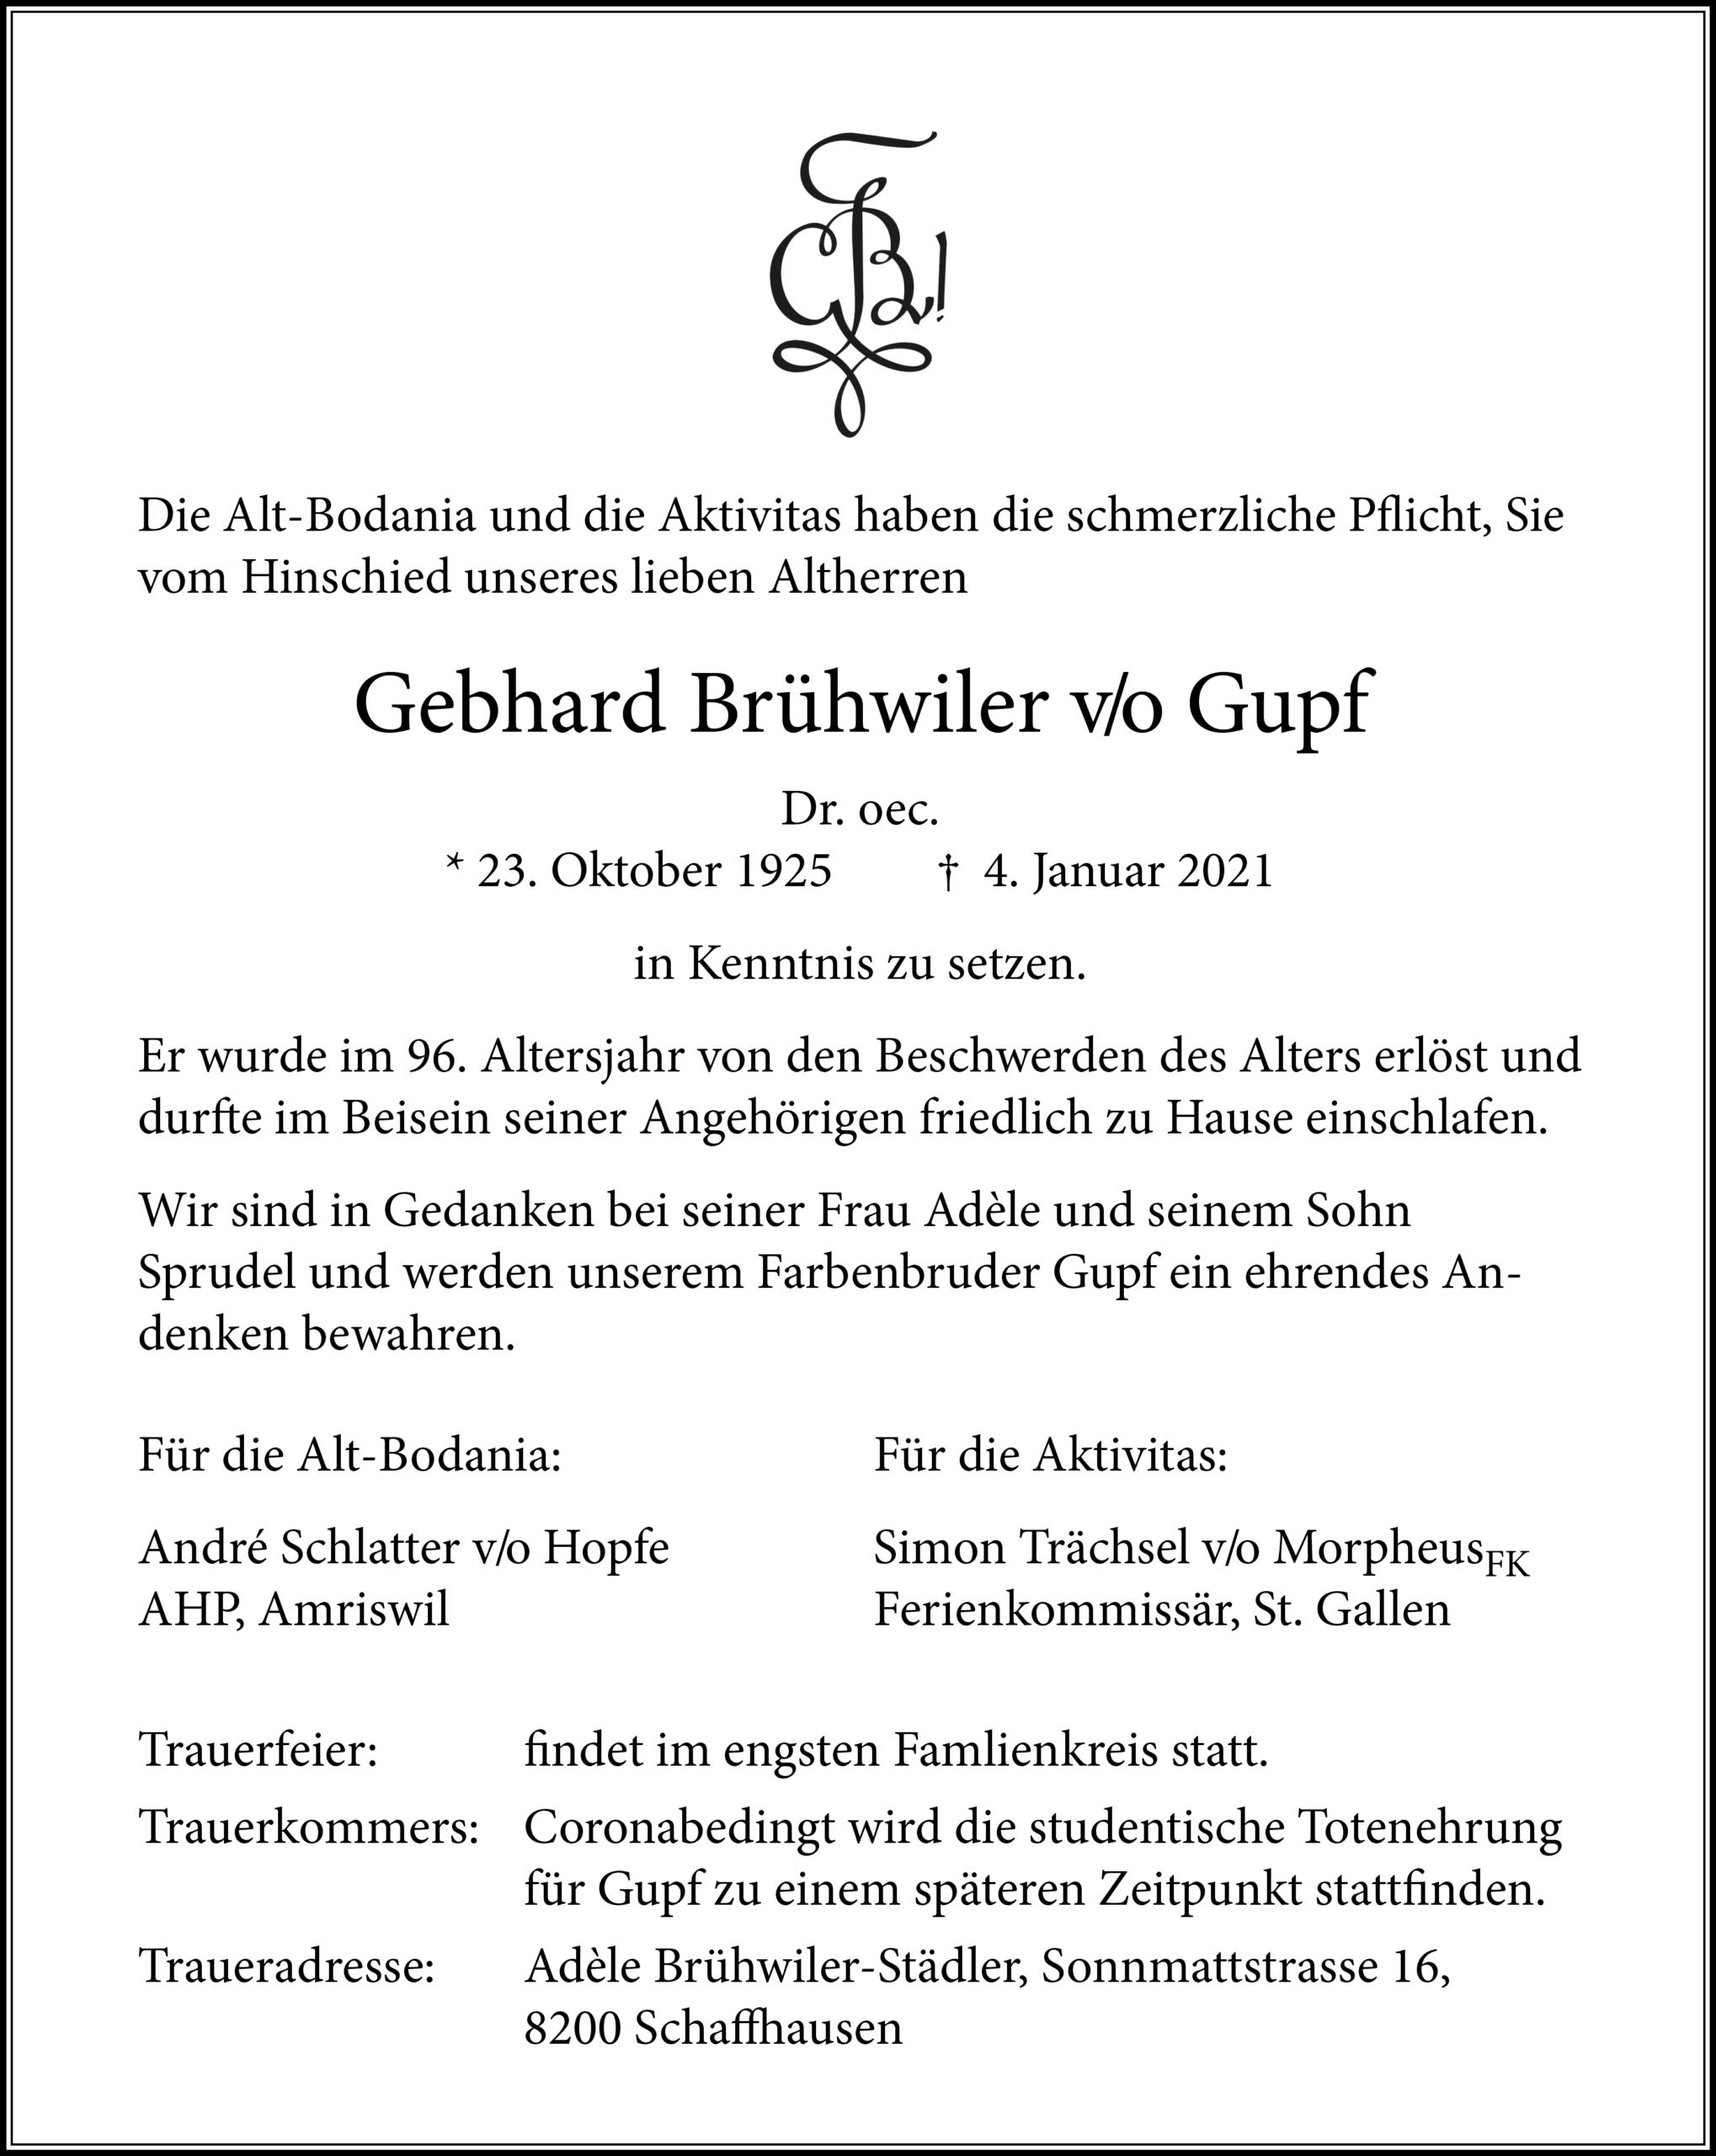 Gebhard Brühwiler v/o Gupf †